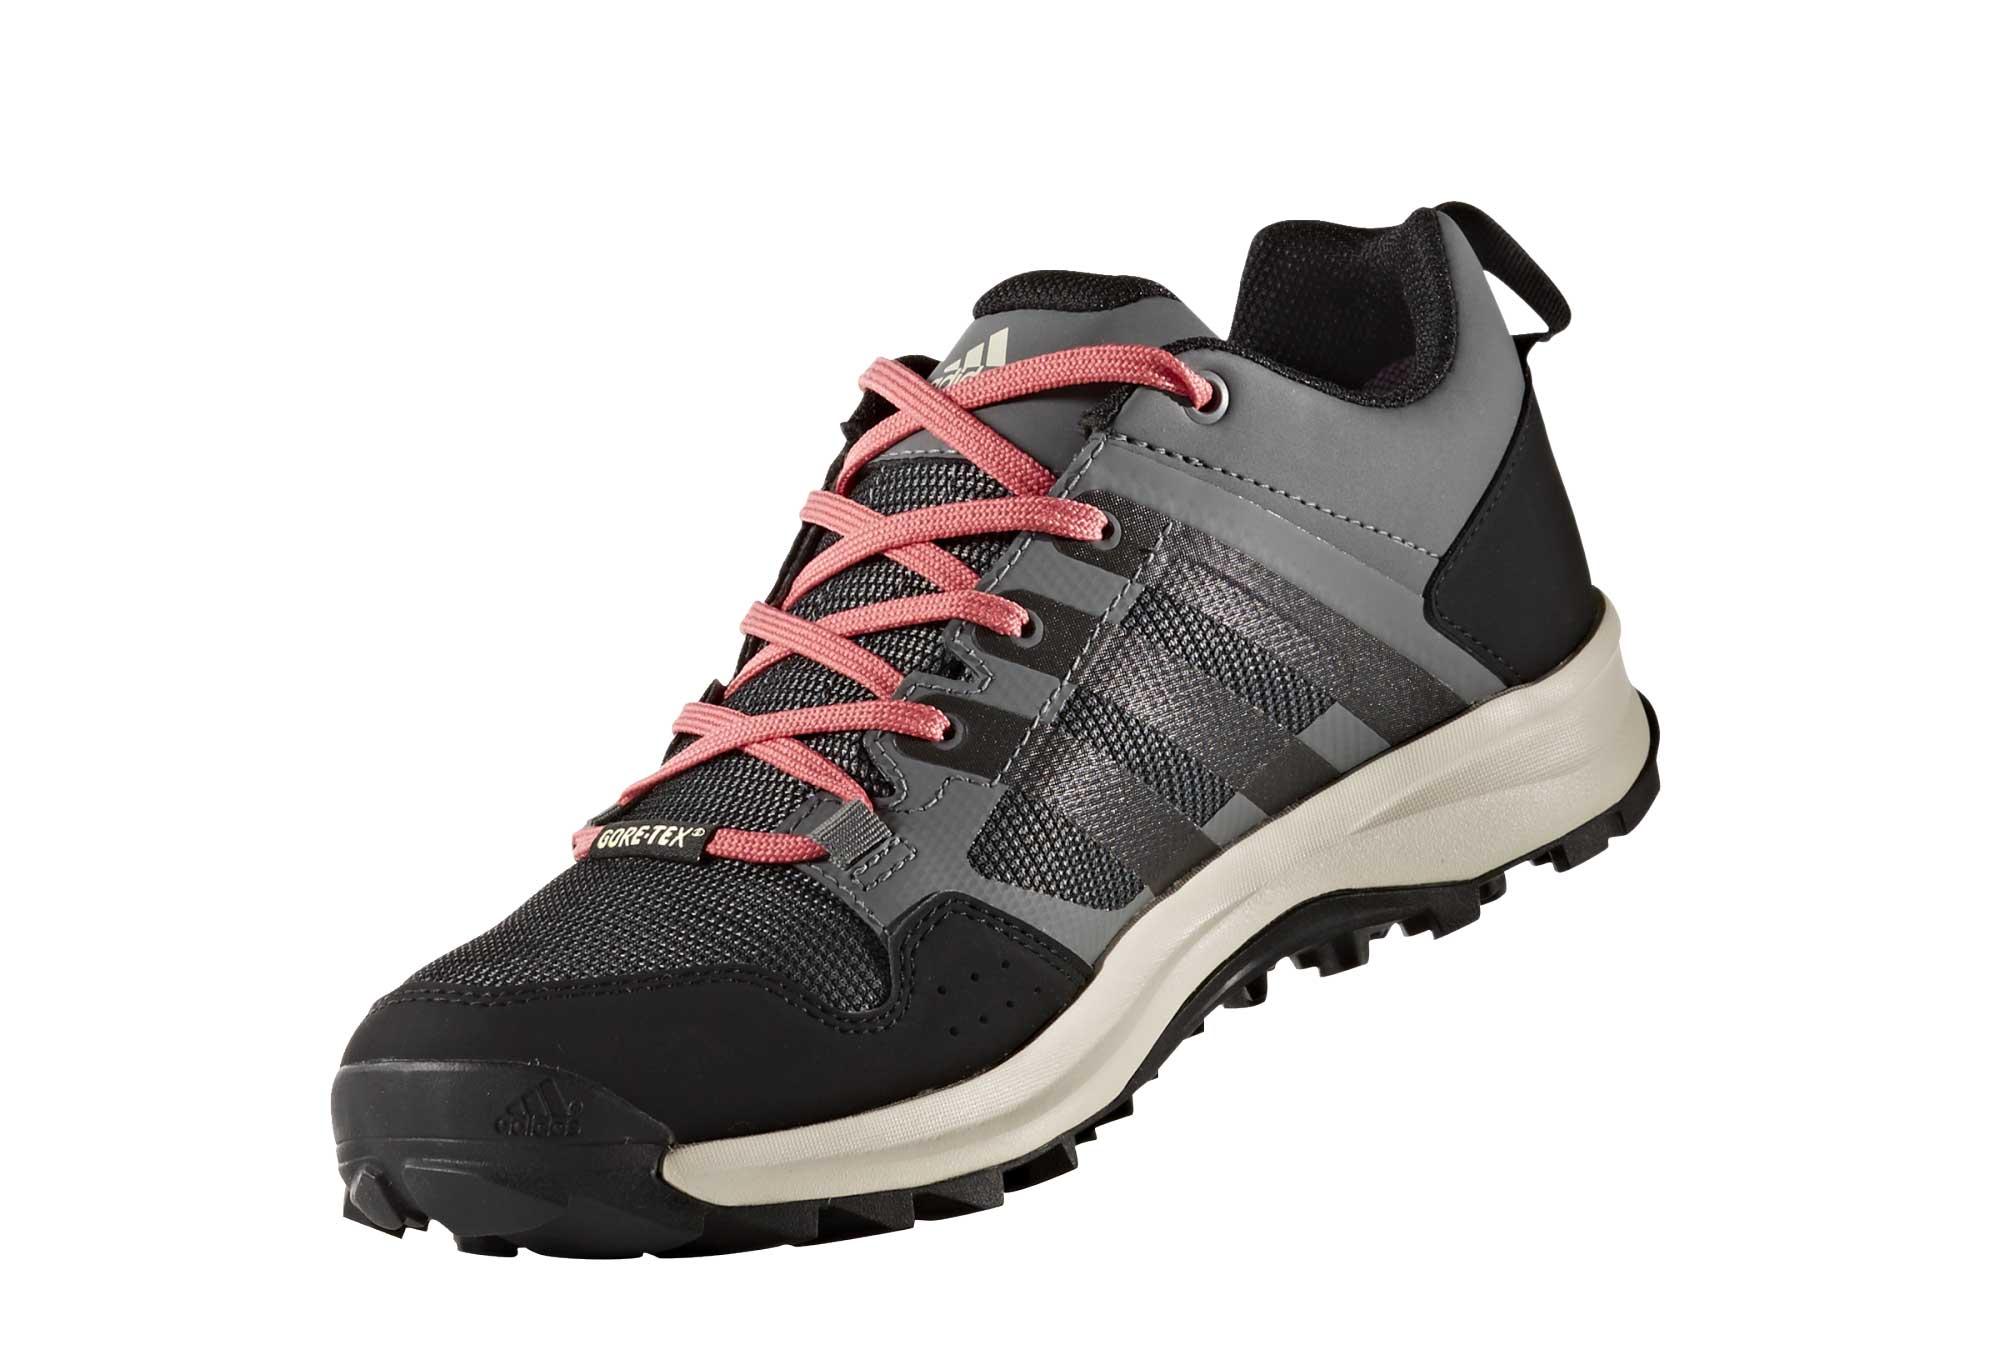 adidas running Kanadia 7 Trail GTX Grey Black Pink Women